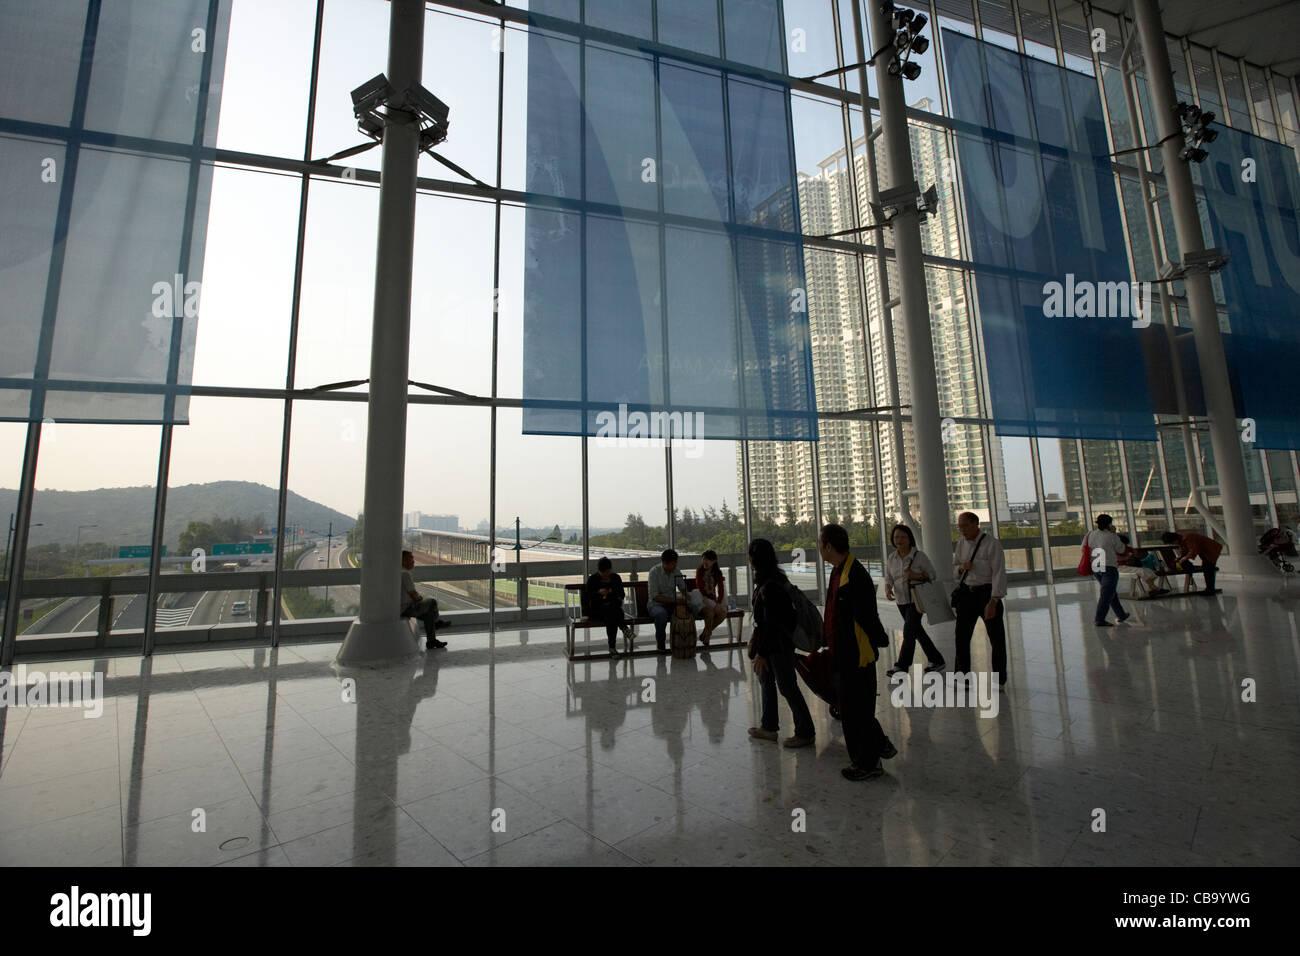 citygate outlets shopping mall in tung chung hong kong hksar china - Stock Image